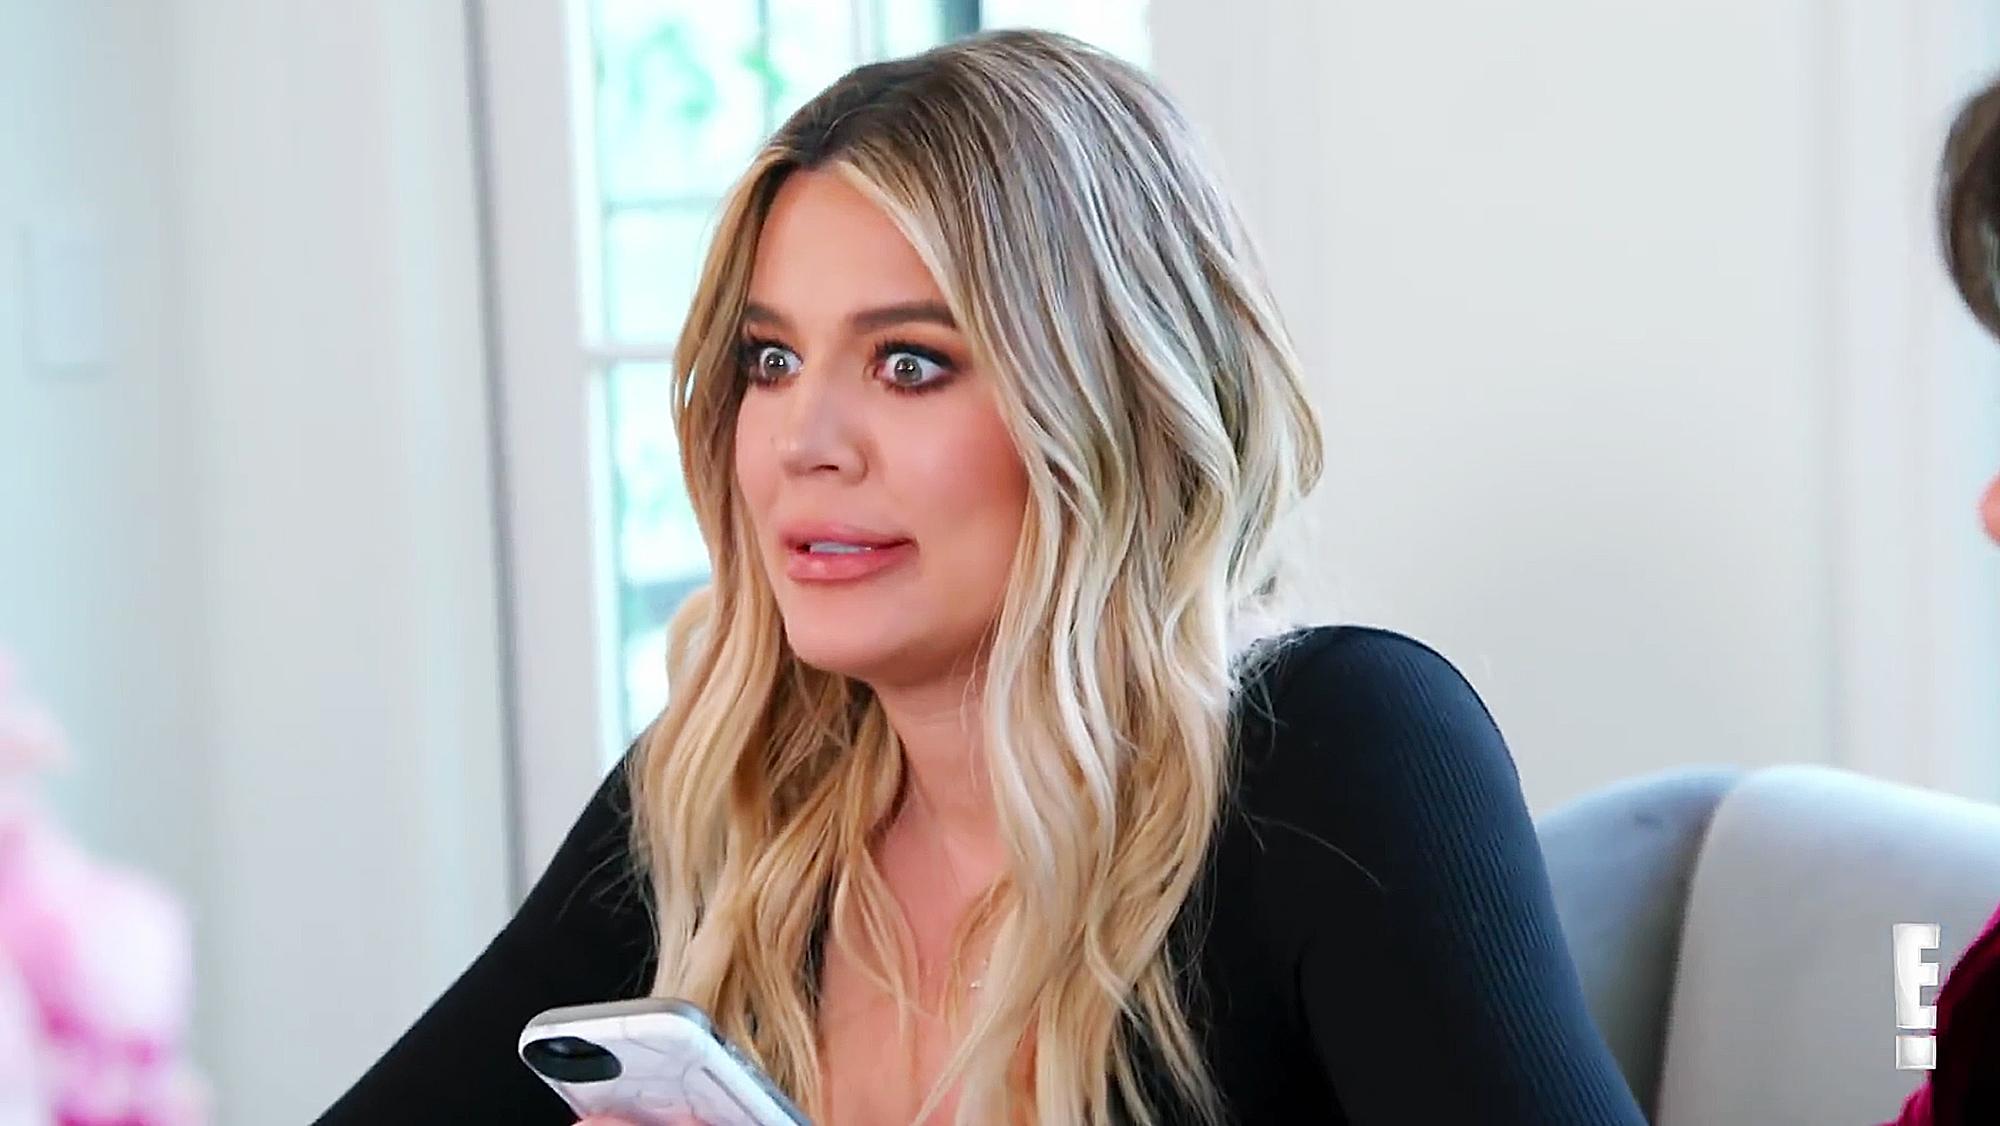 Khloe Kardashian Kim Kardashian Slams Kourtney Kardashian Entitled